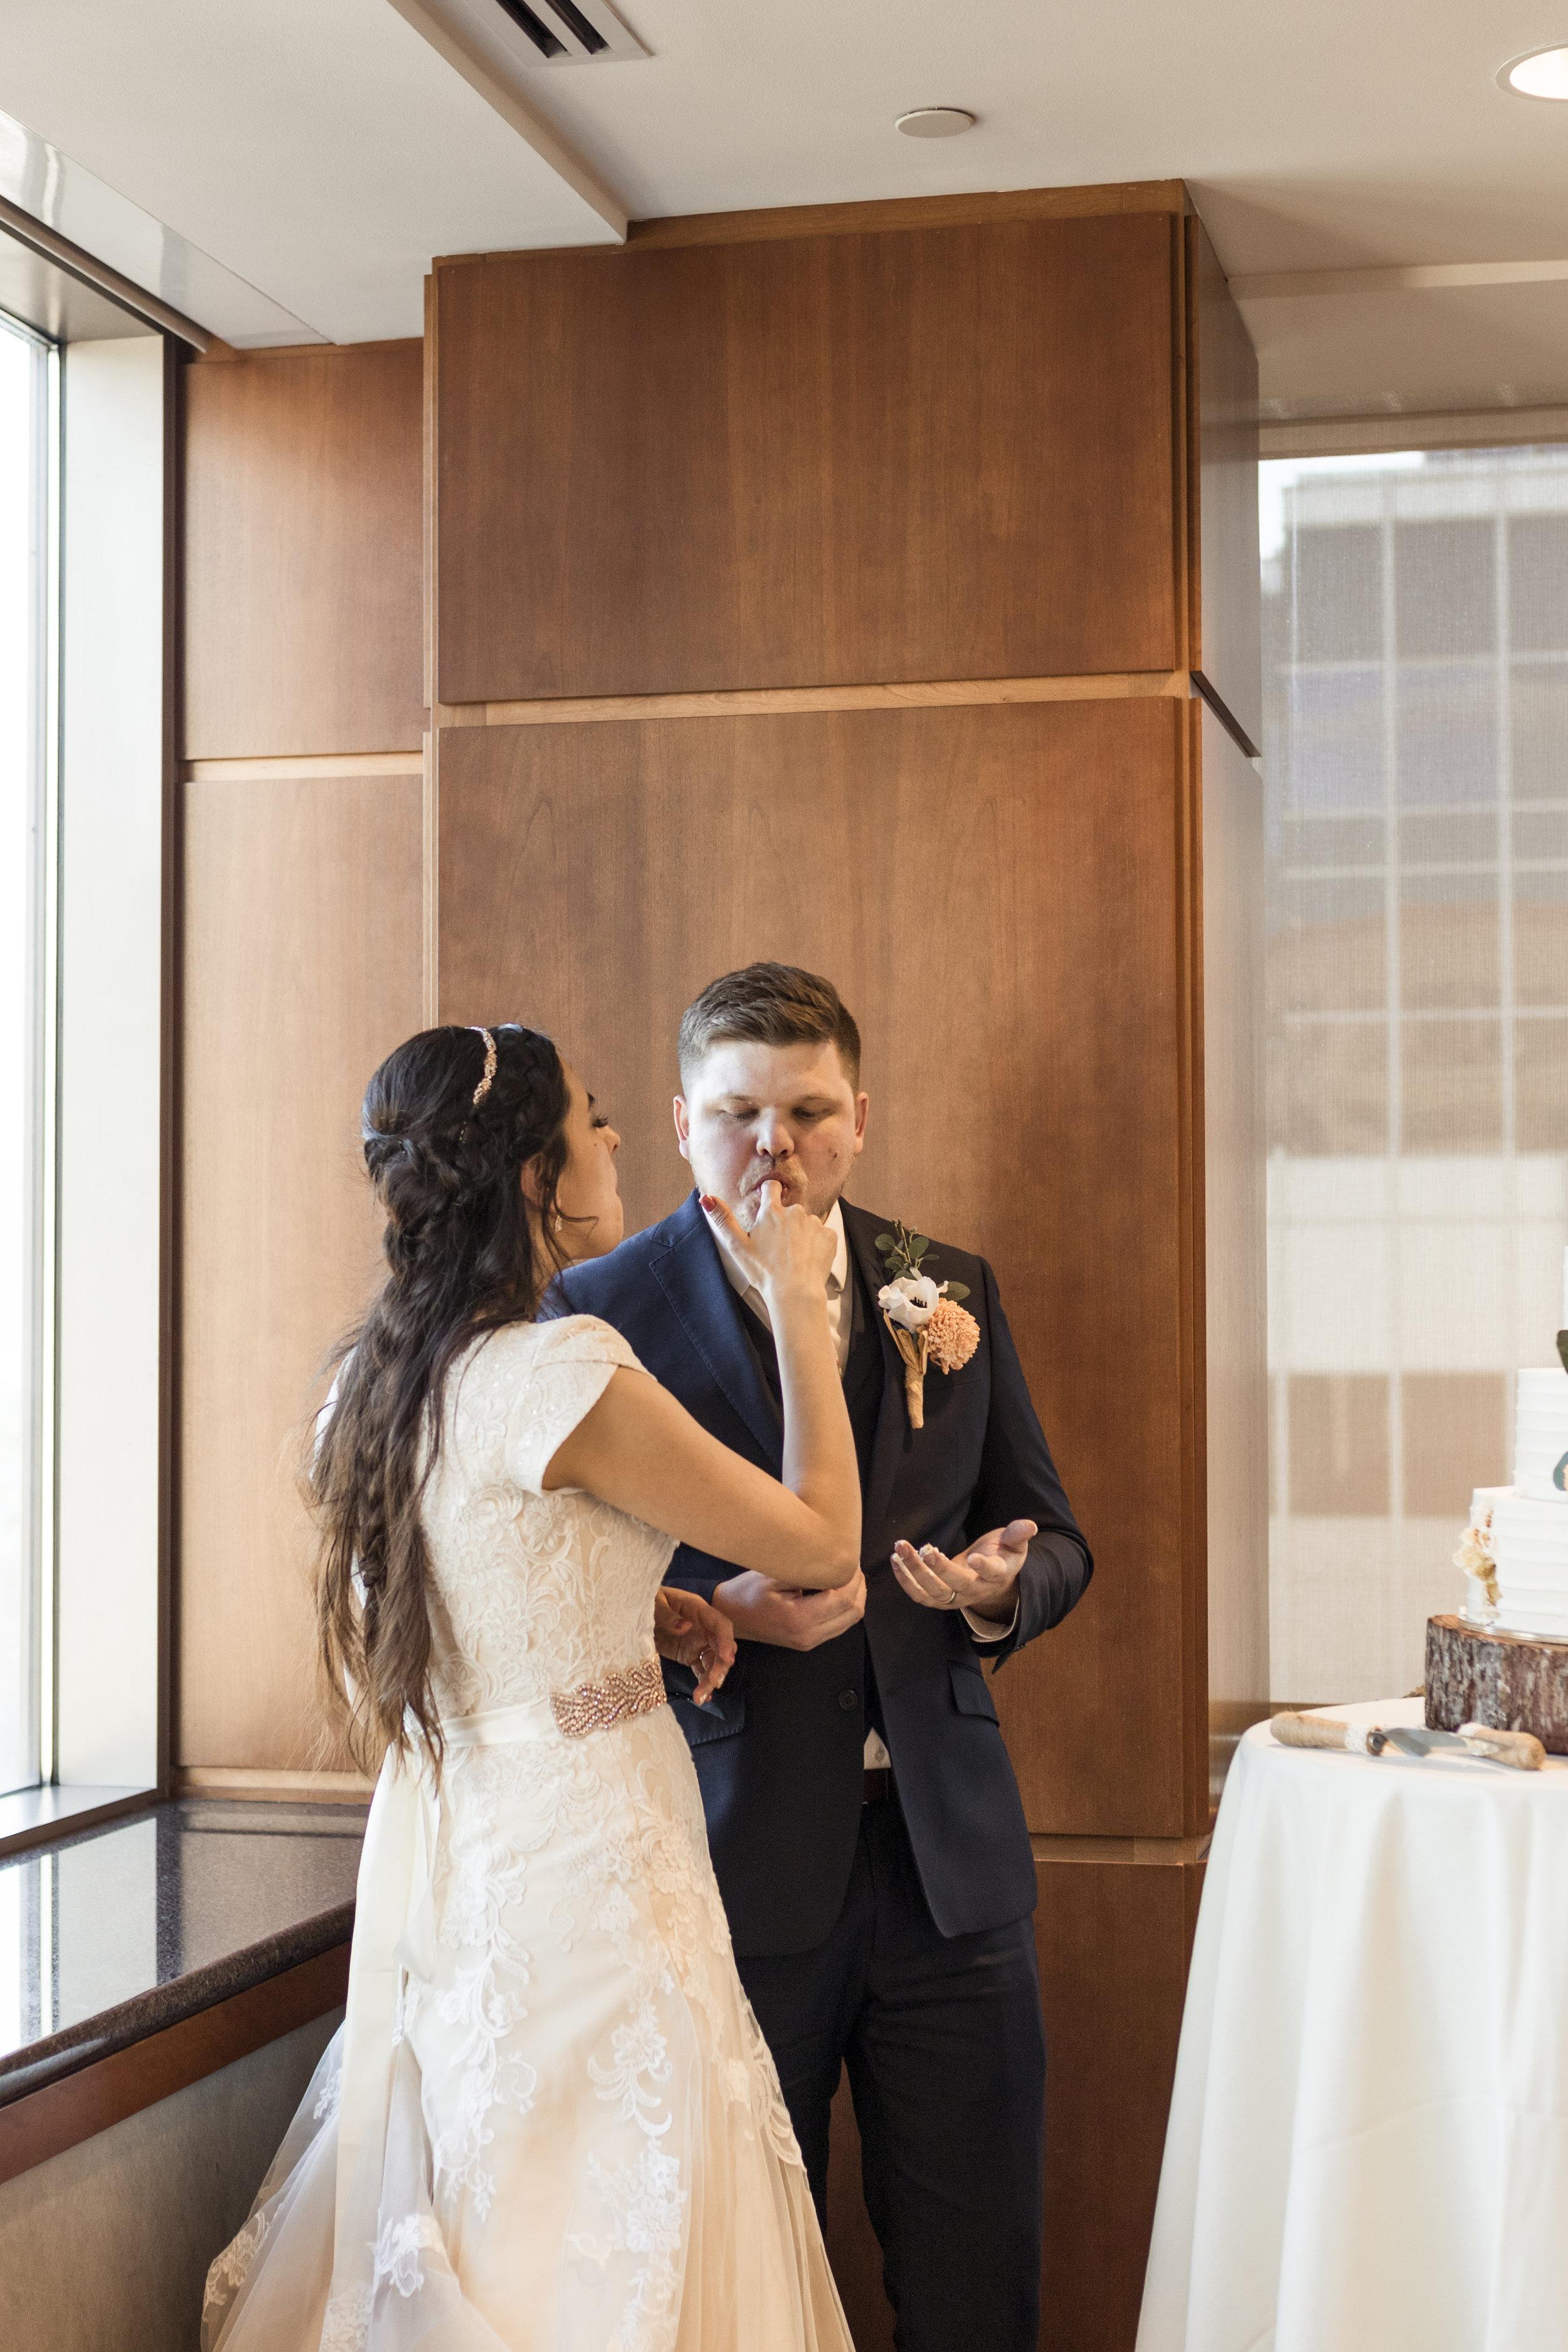 Utah Spring Wedding Reception in the Zions Bank Founders Room by Bri Bergman Photography16.JPG